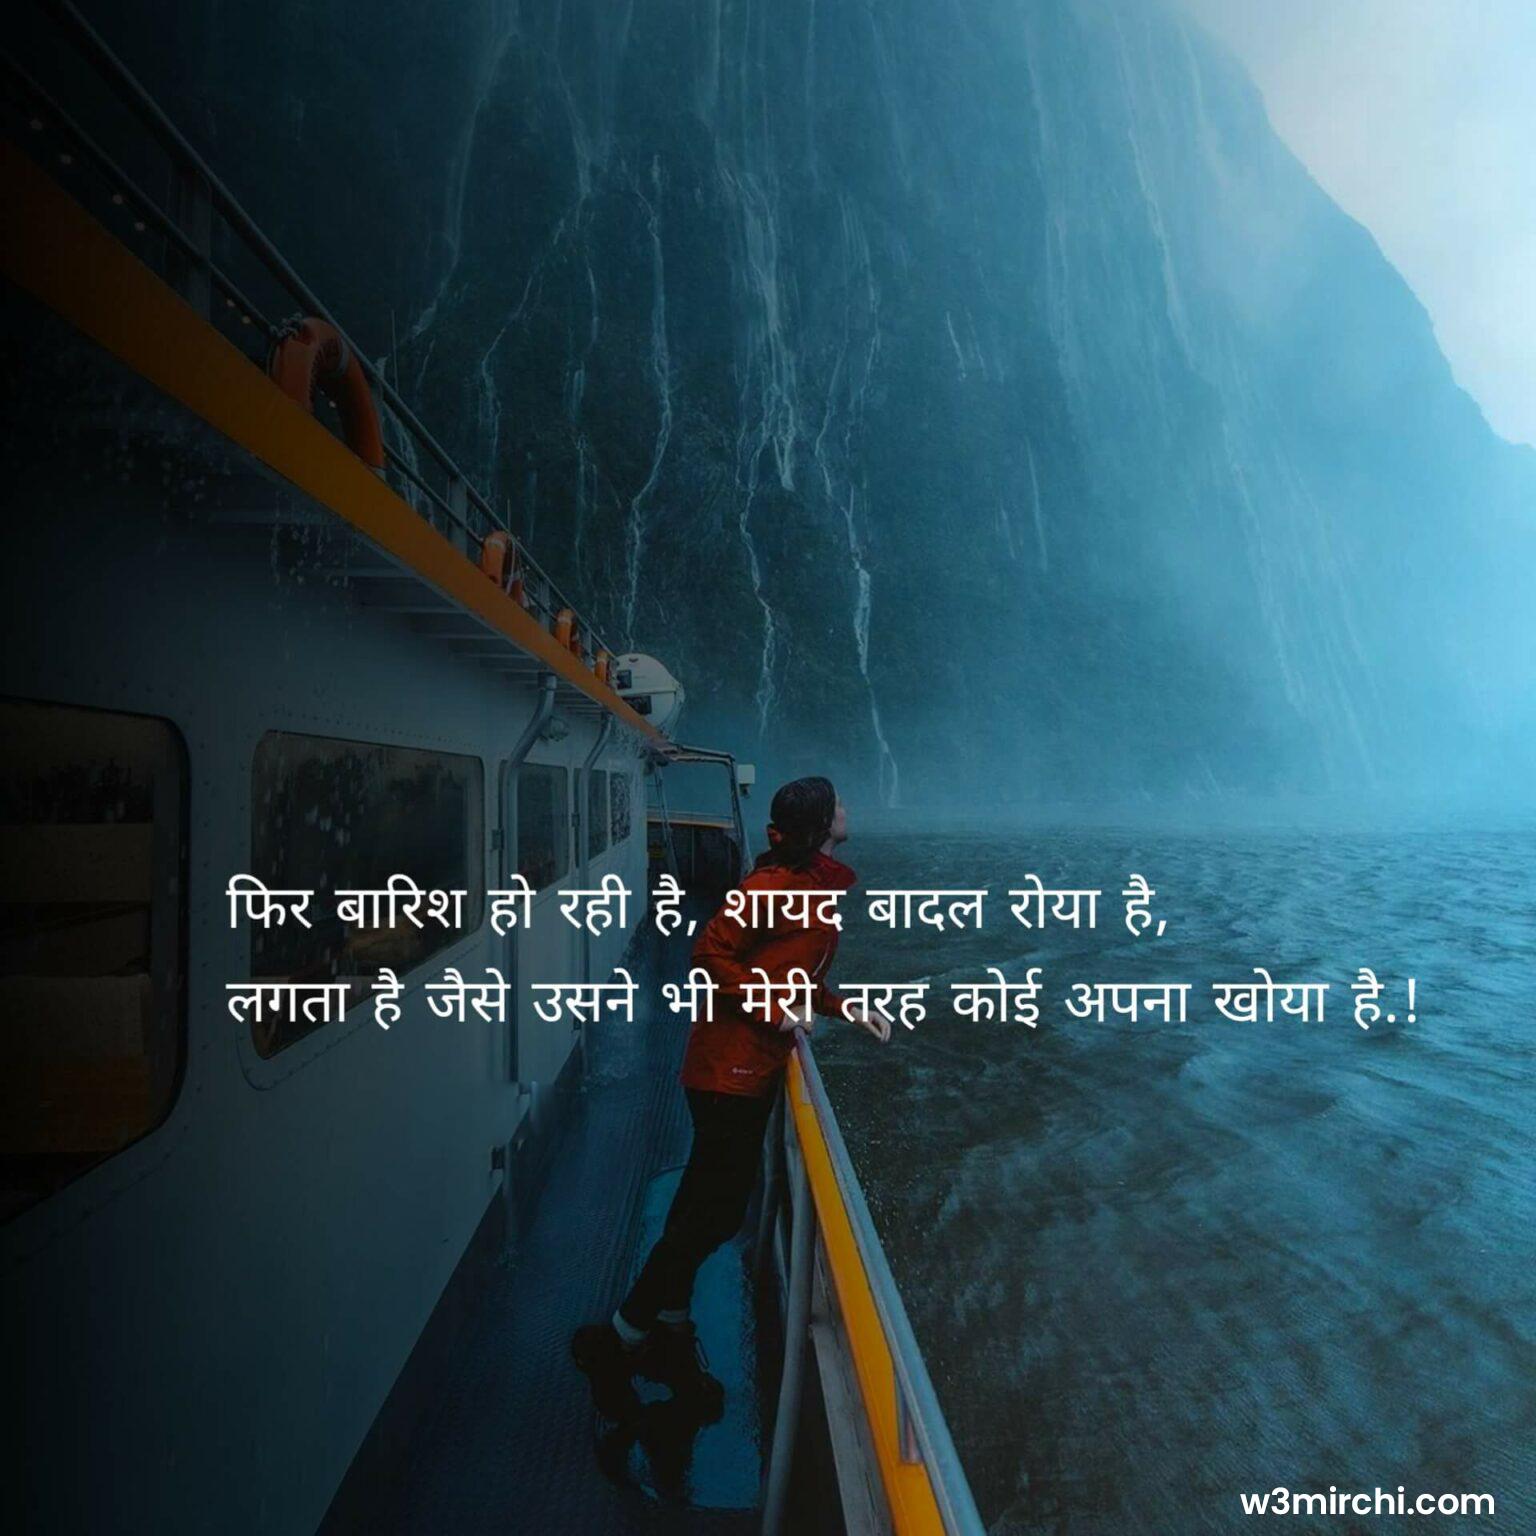 Barish Pe Shayari      फिर बारिश हो रही है